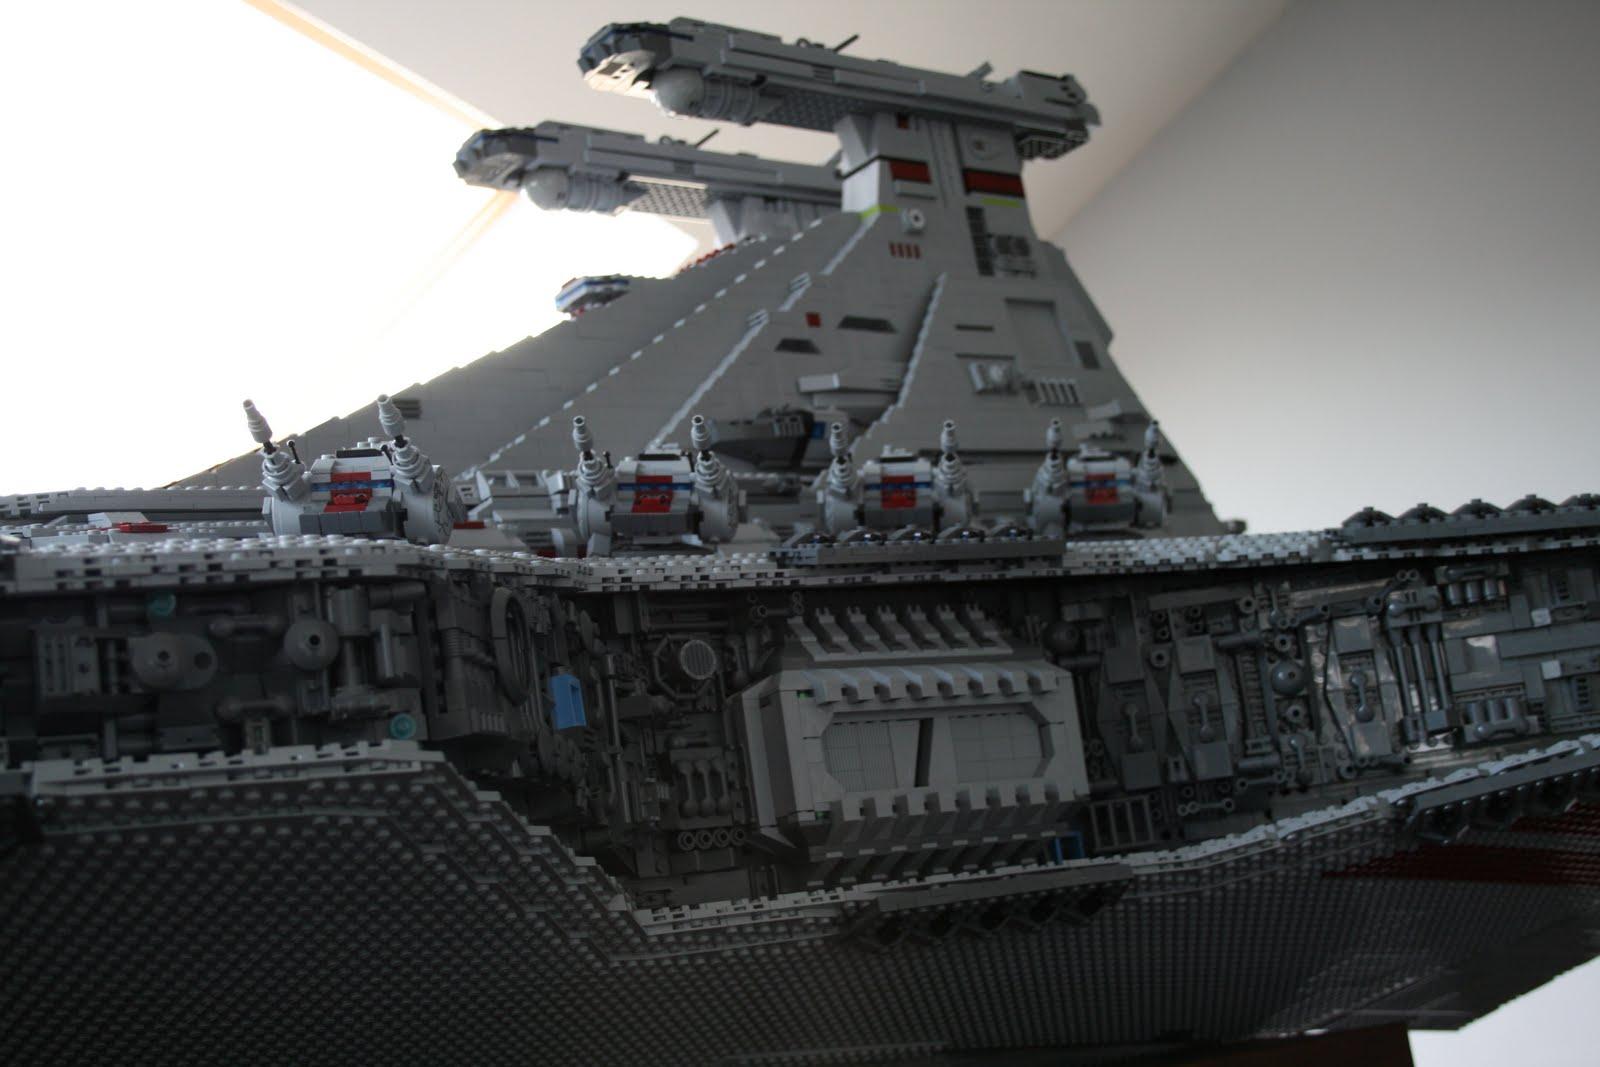 lego republic star destroyer - photo #3